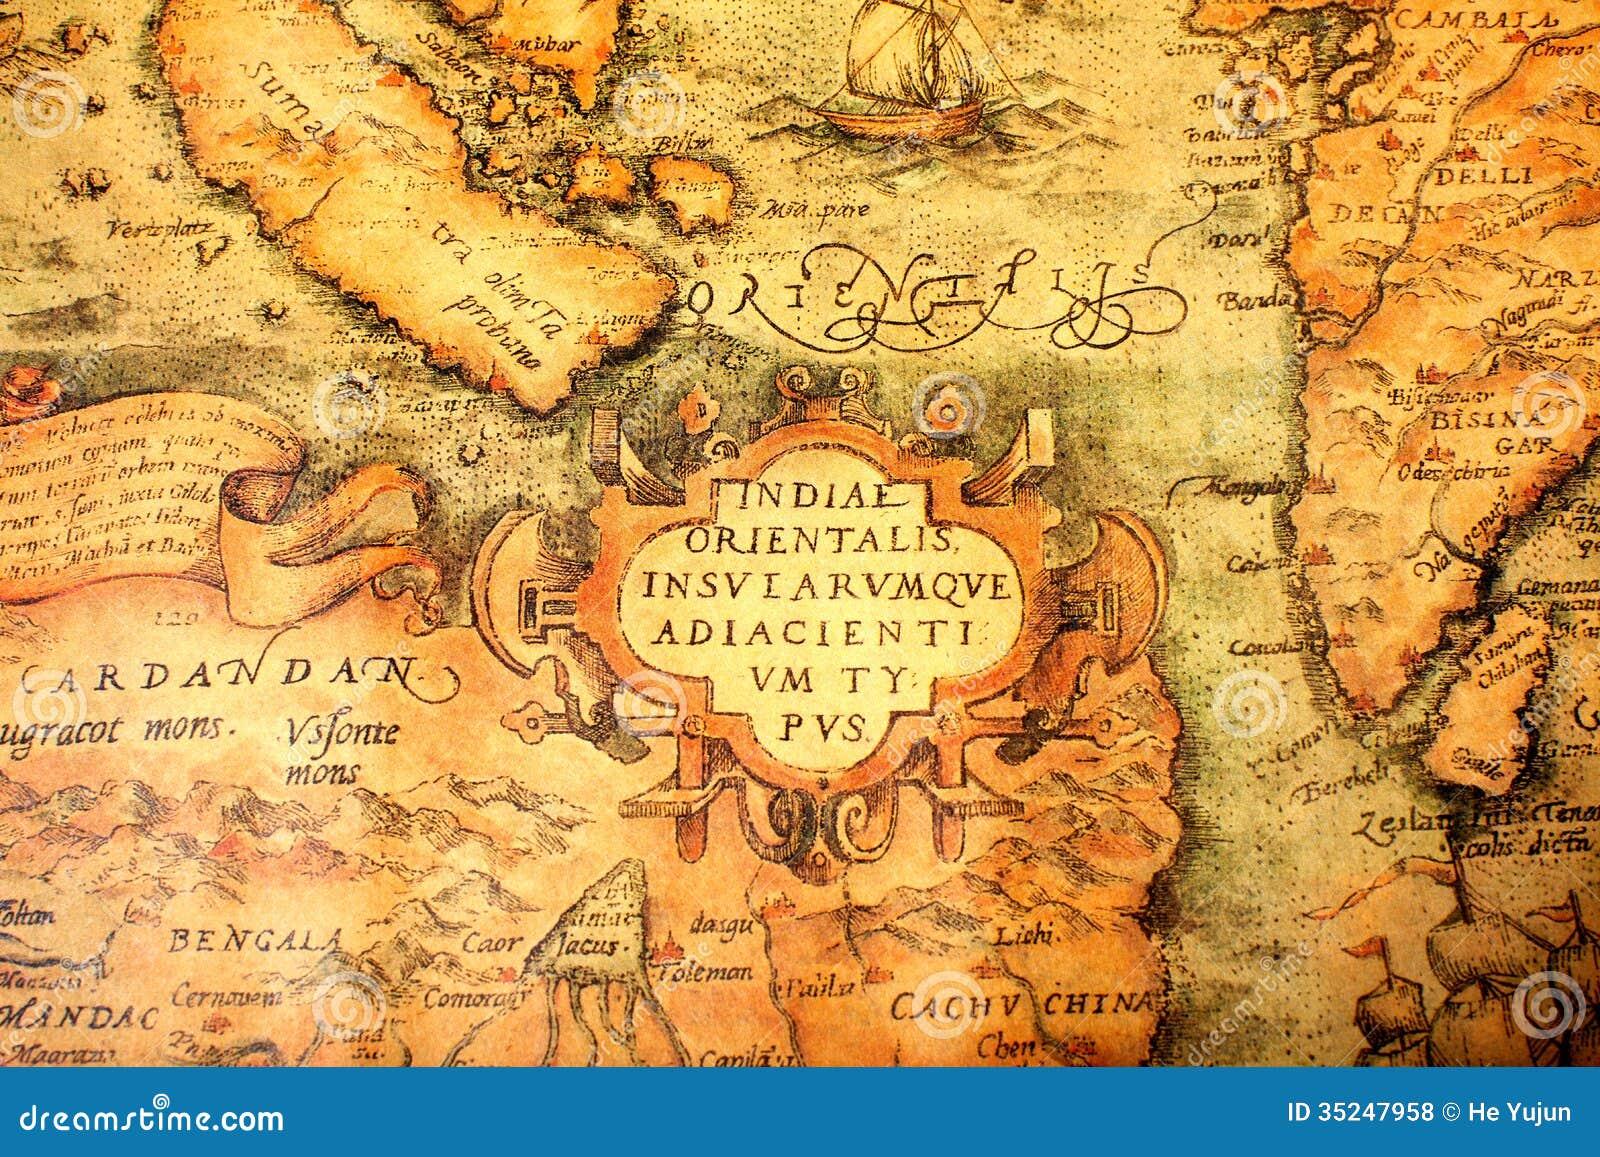 ancient global map royalty - photo #1